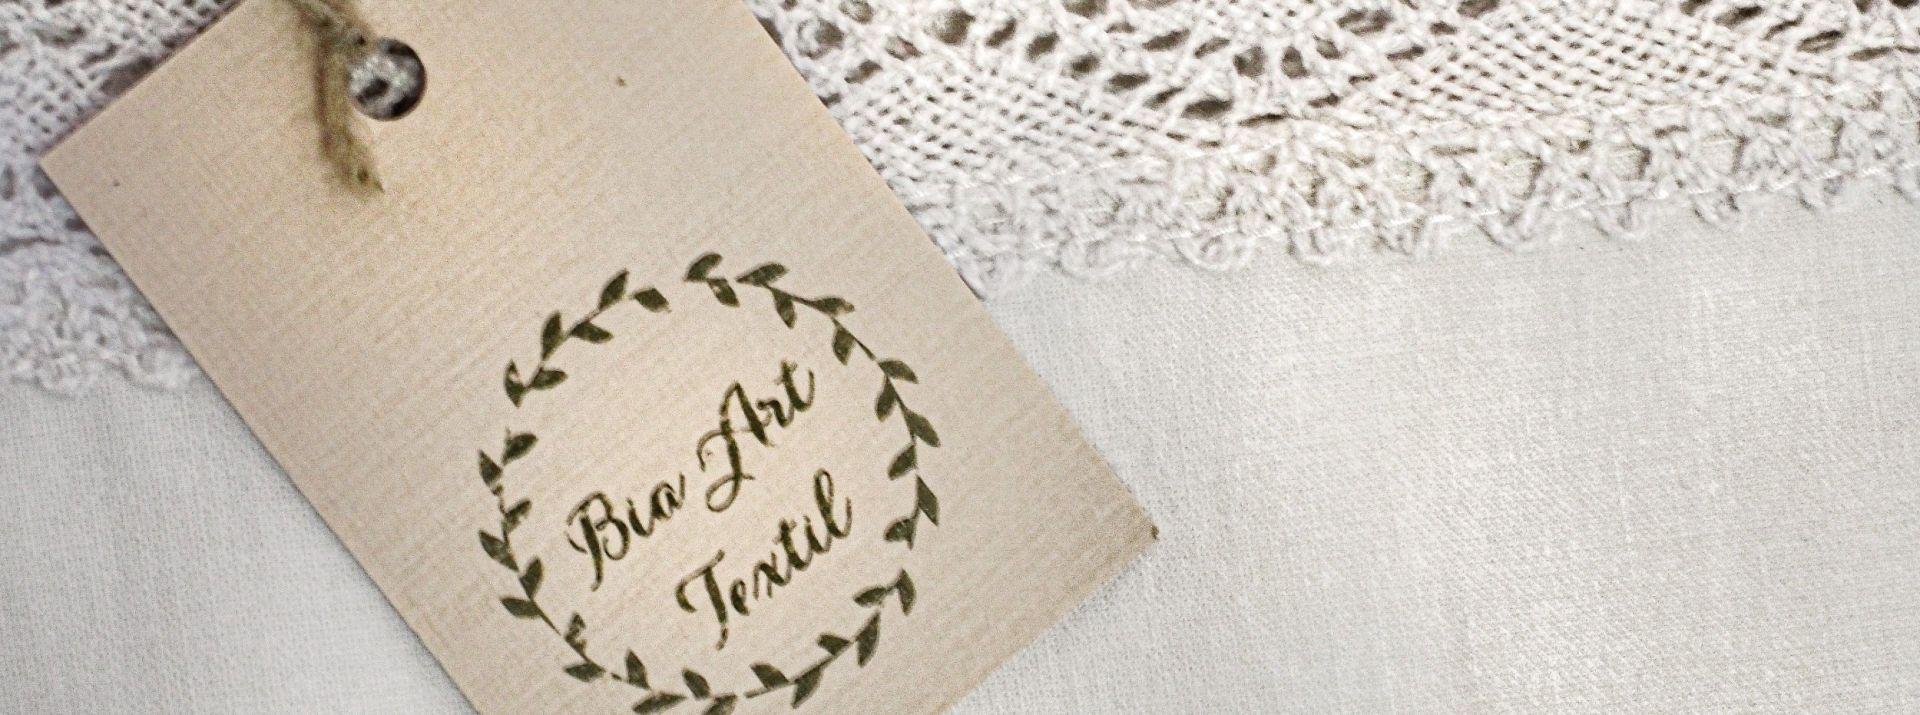 Bia Art Textil - Tradiție la îndemâna voastră